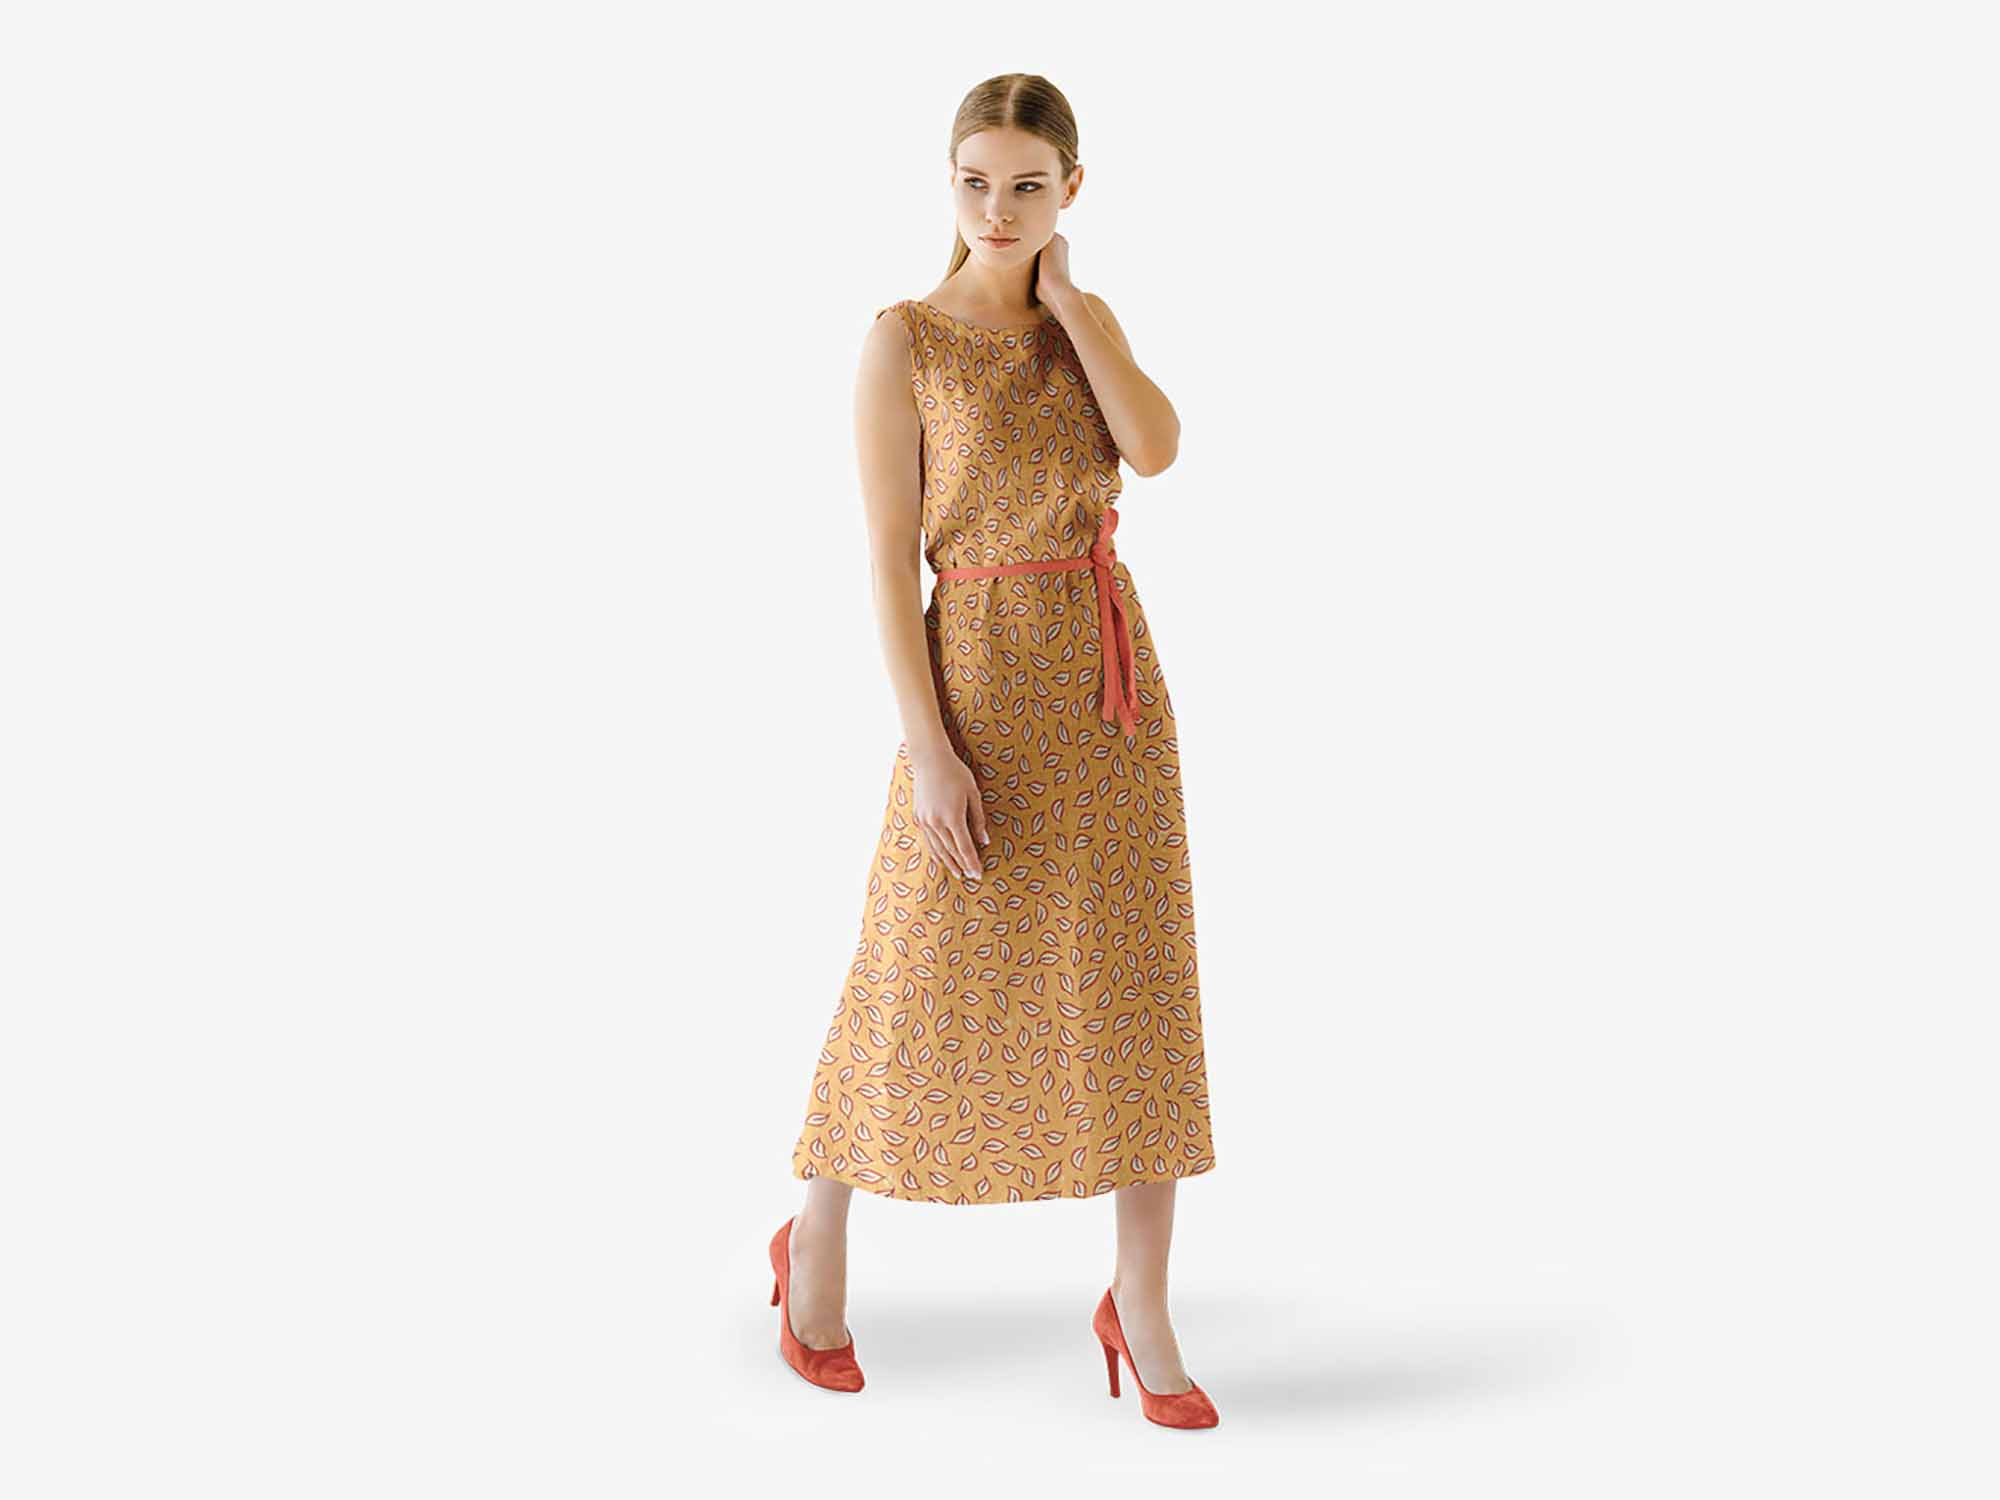 Summer Dress Mockup